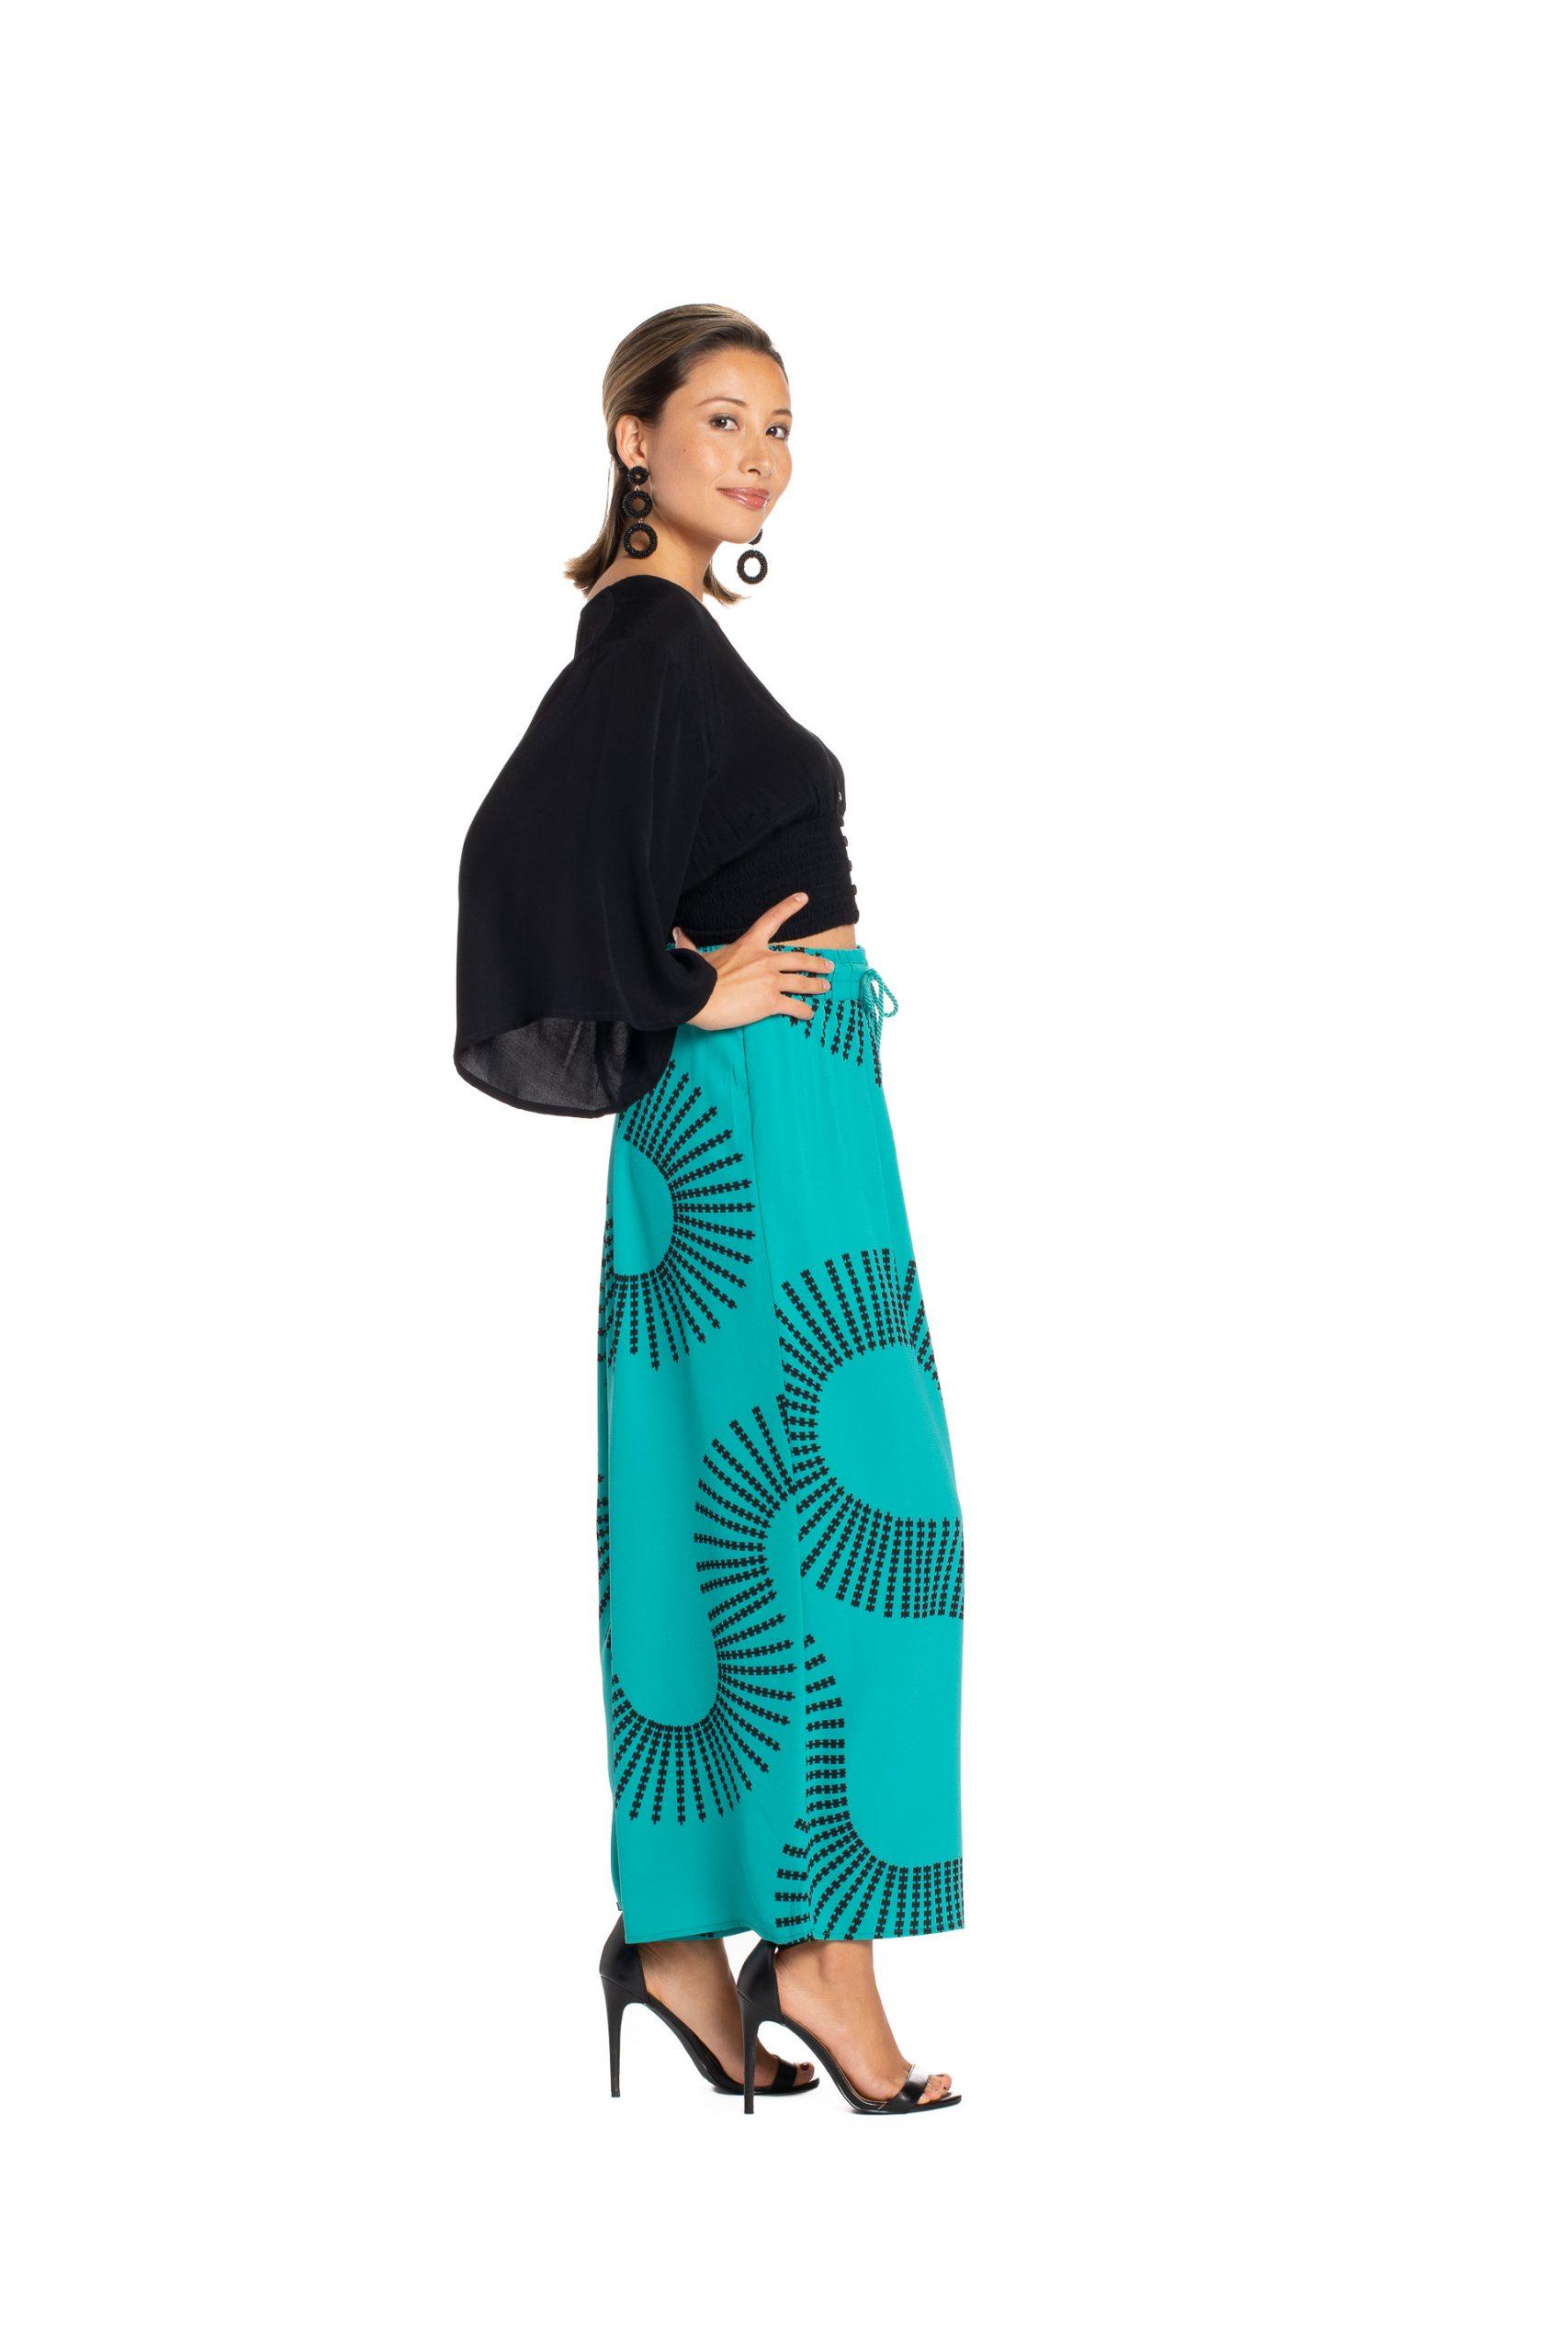 Model wearing Kapakai Flow Pant in Blue Grass - Side View